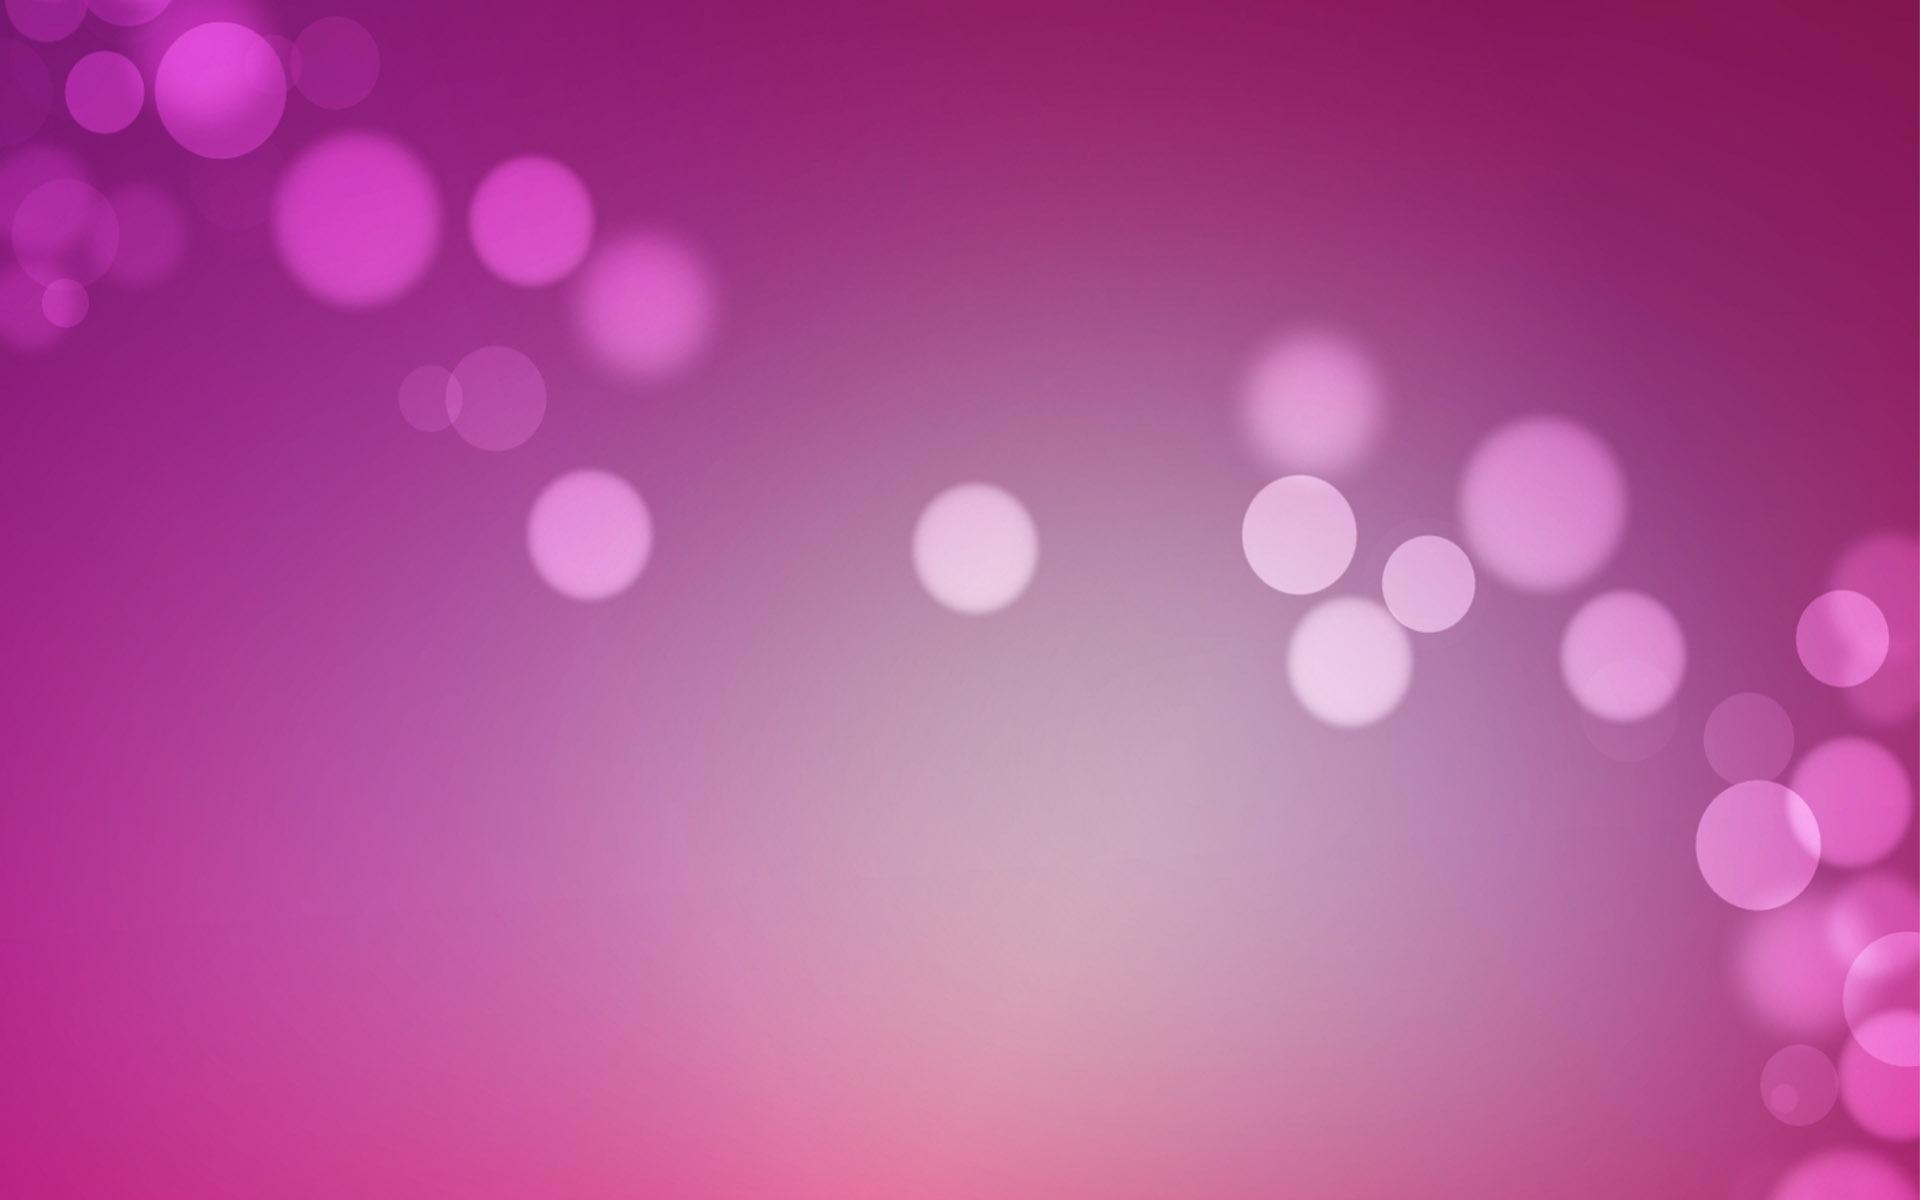 Bright Color Background Wallpaper 18 10 1920x1200